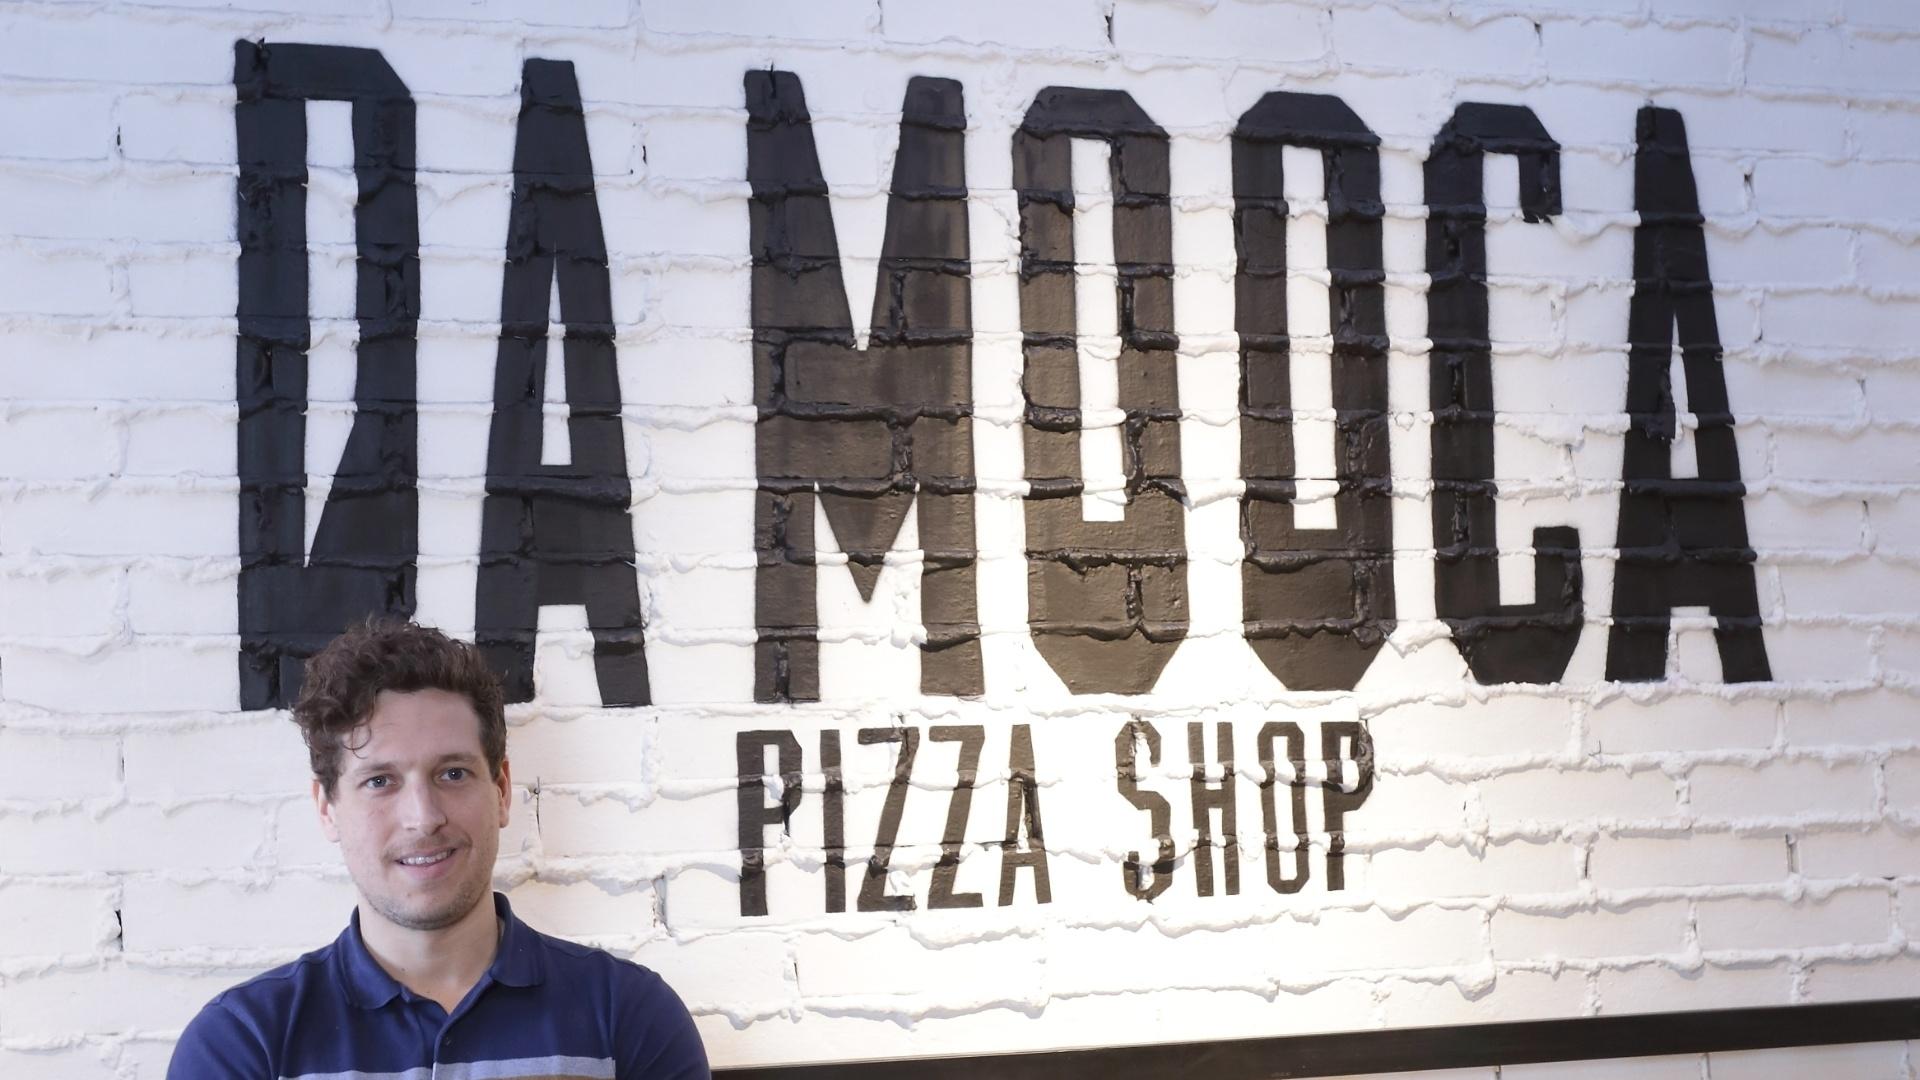 Da Mooca Pizza Shop Fellipe Zanuto